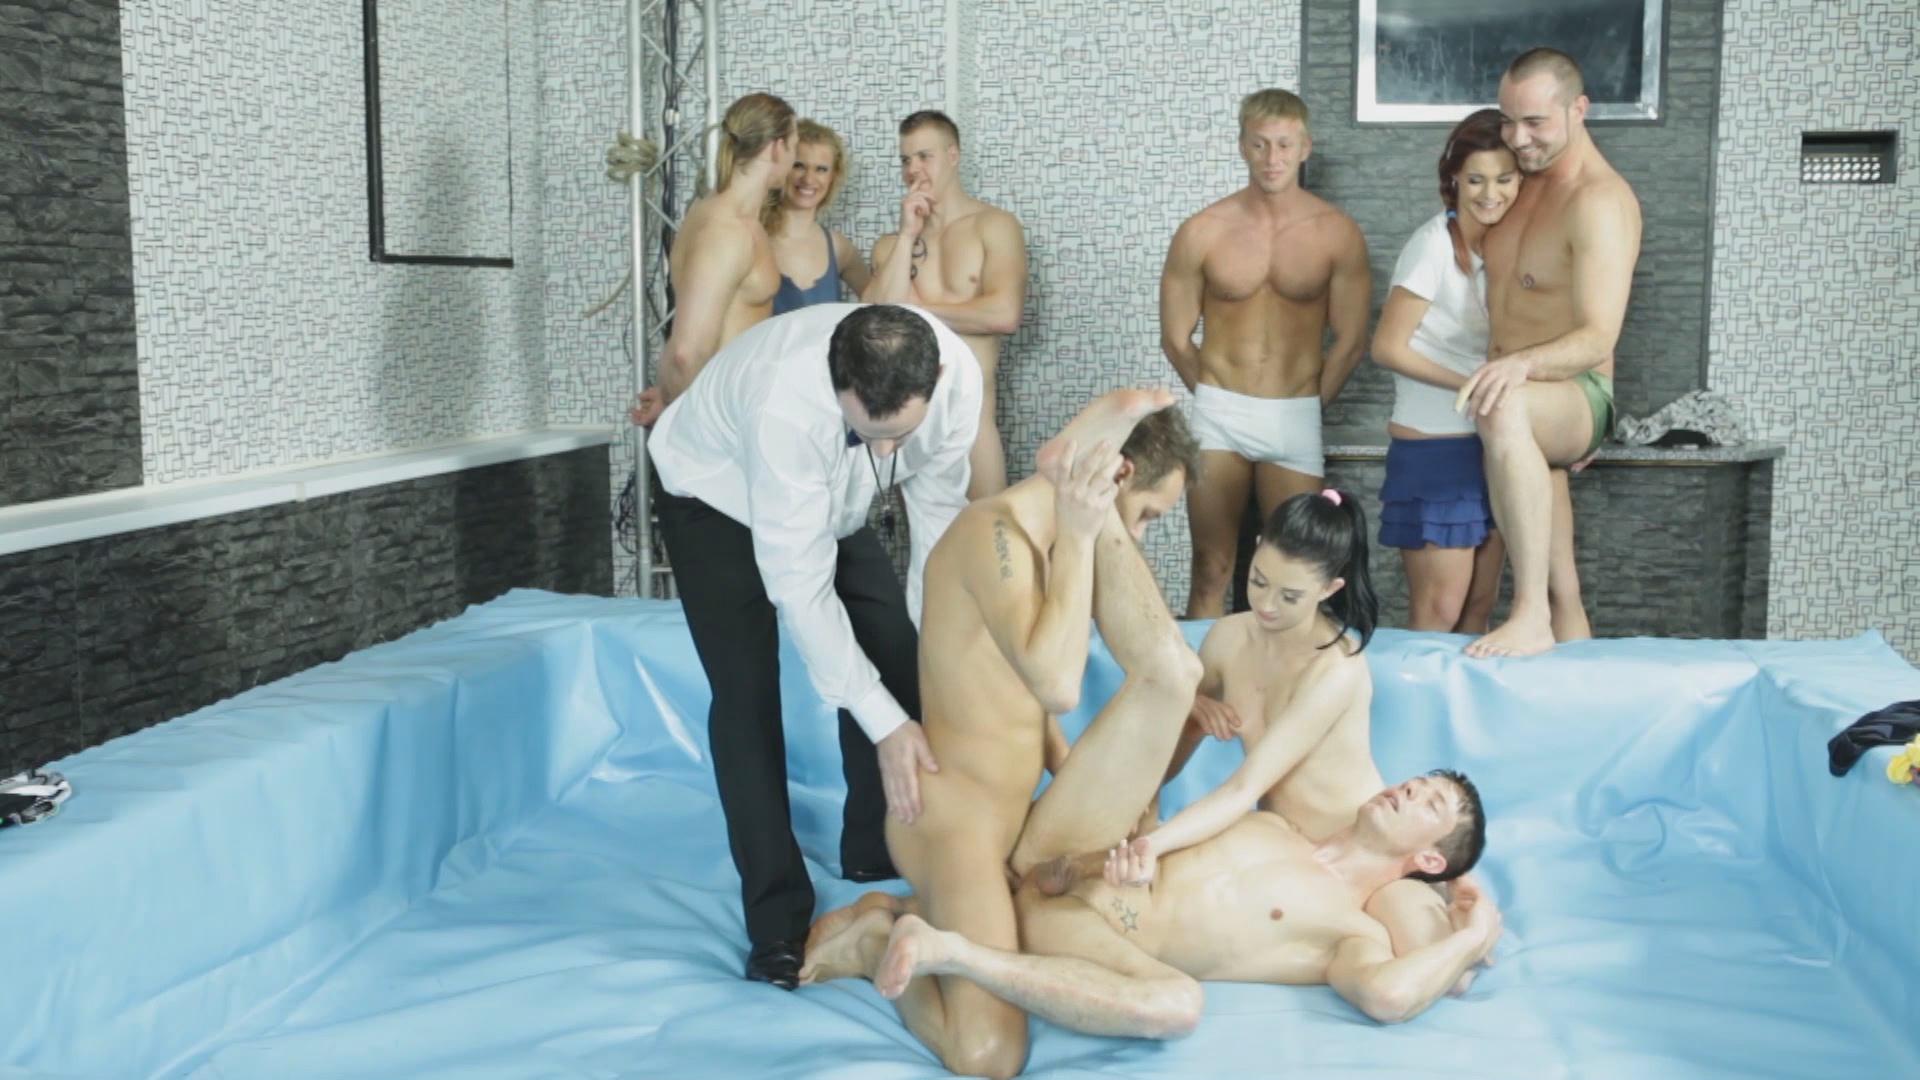 Bi Sex Party 30: Bi Brawlers xvideos196783